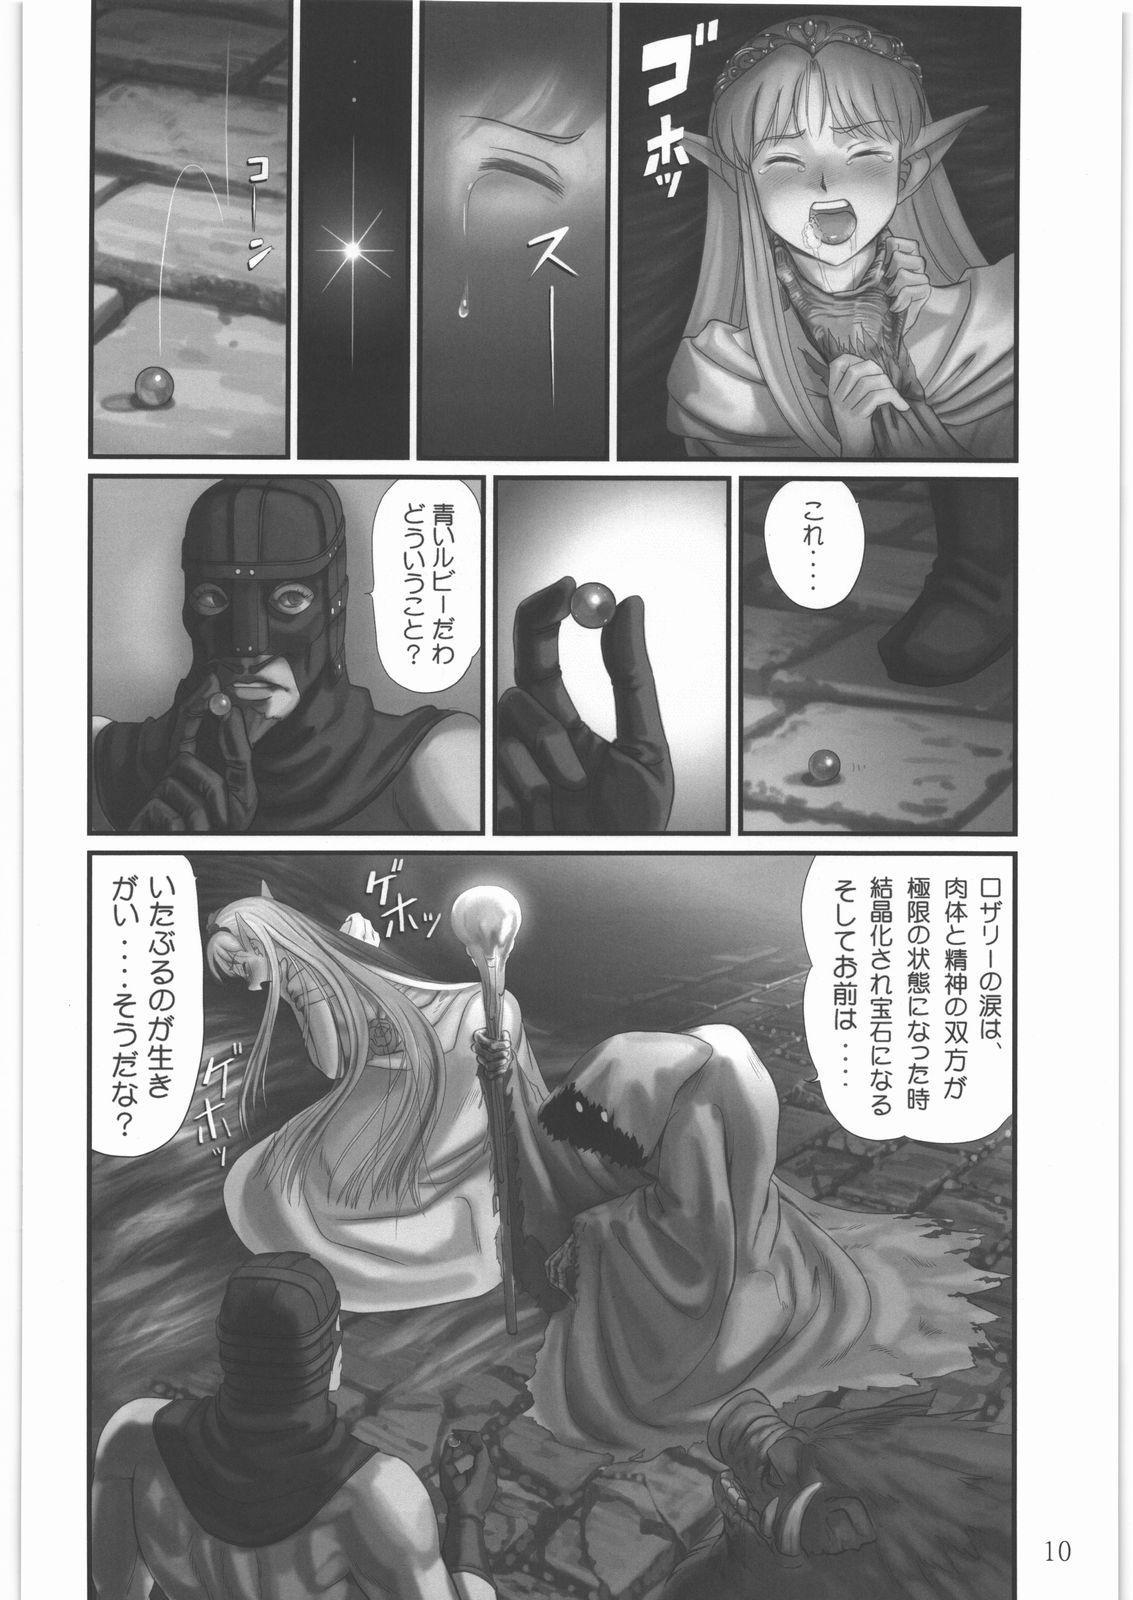 Elf Ryoujoku 8